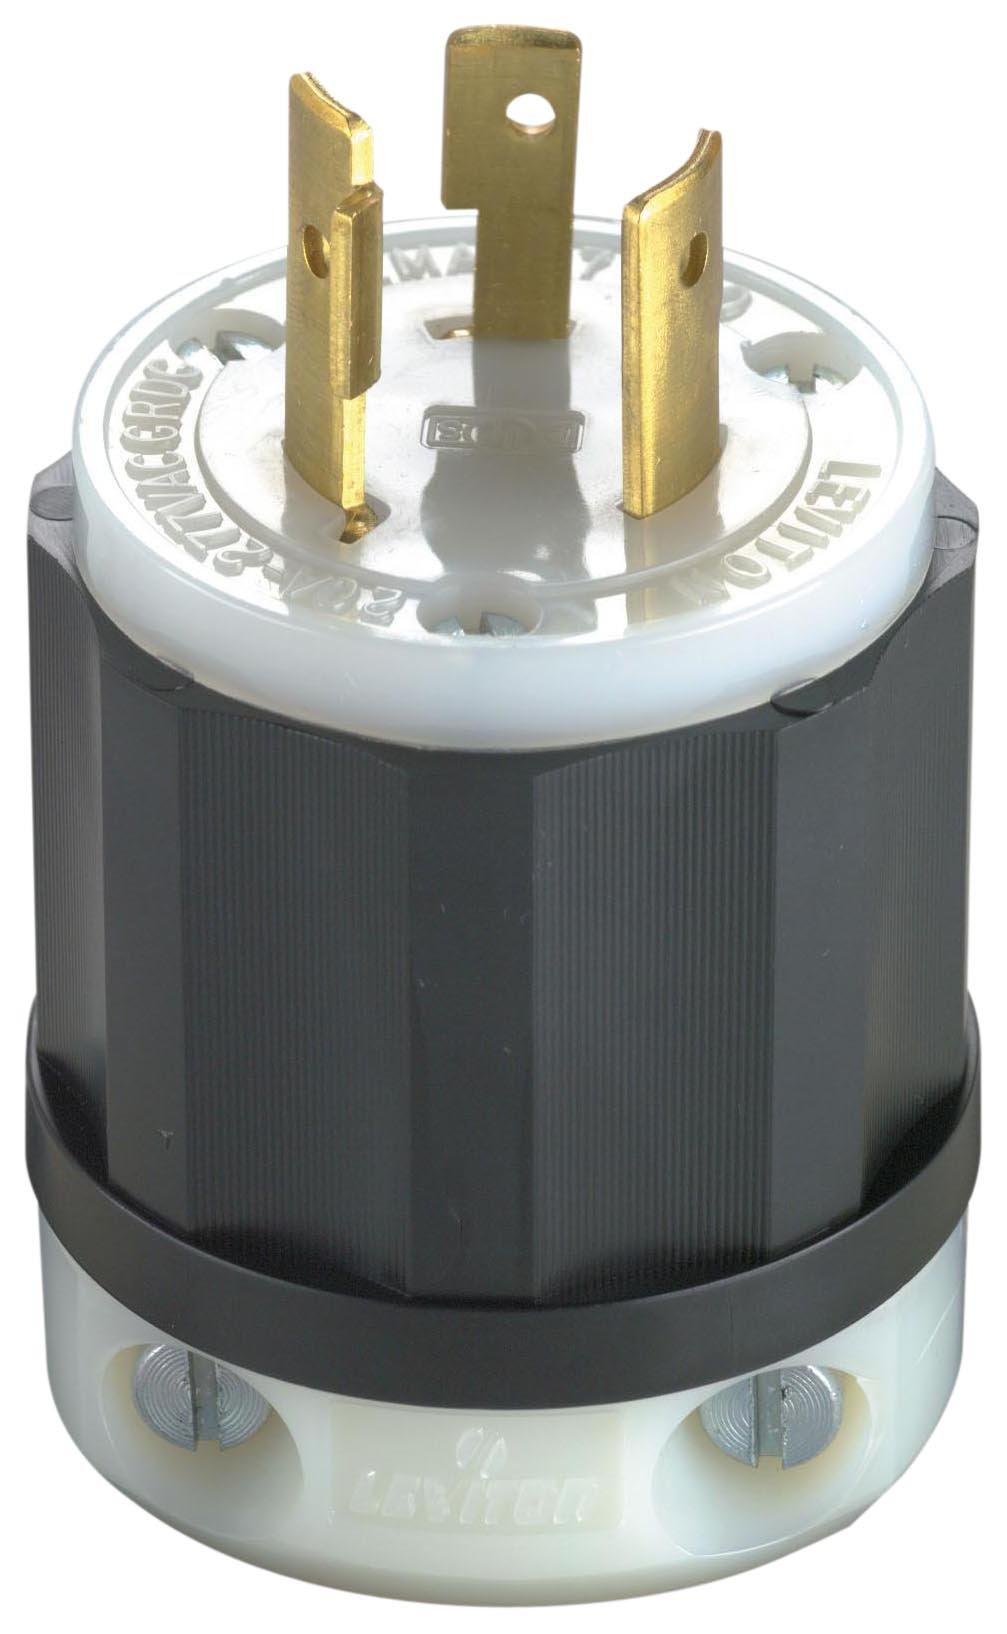 Leviton 2331 20 Amp, 277 Volt, NEMA L7-20P, 2P, 3W, Locking Plug, Industrial Grade, Grounding - Black-White